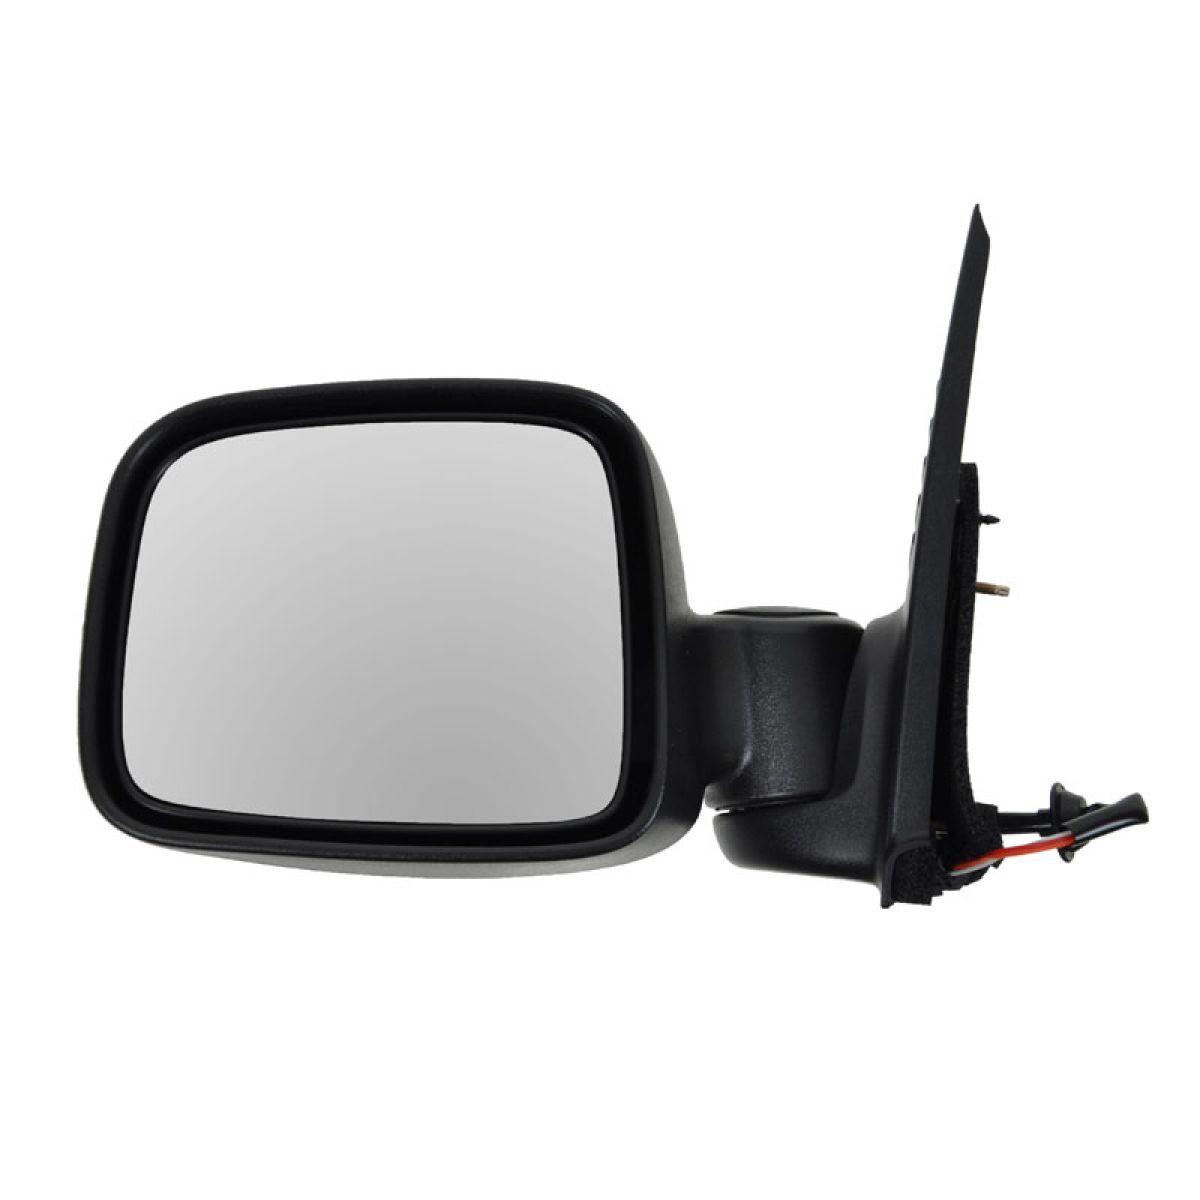 Textured Black For PT Cruiser 04-09 Driver Side Mirror